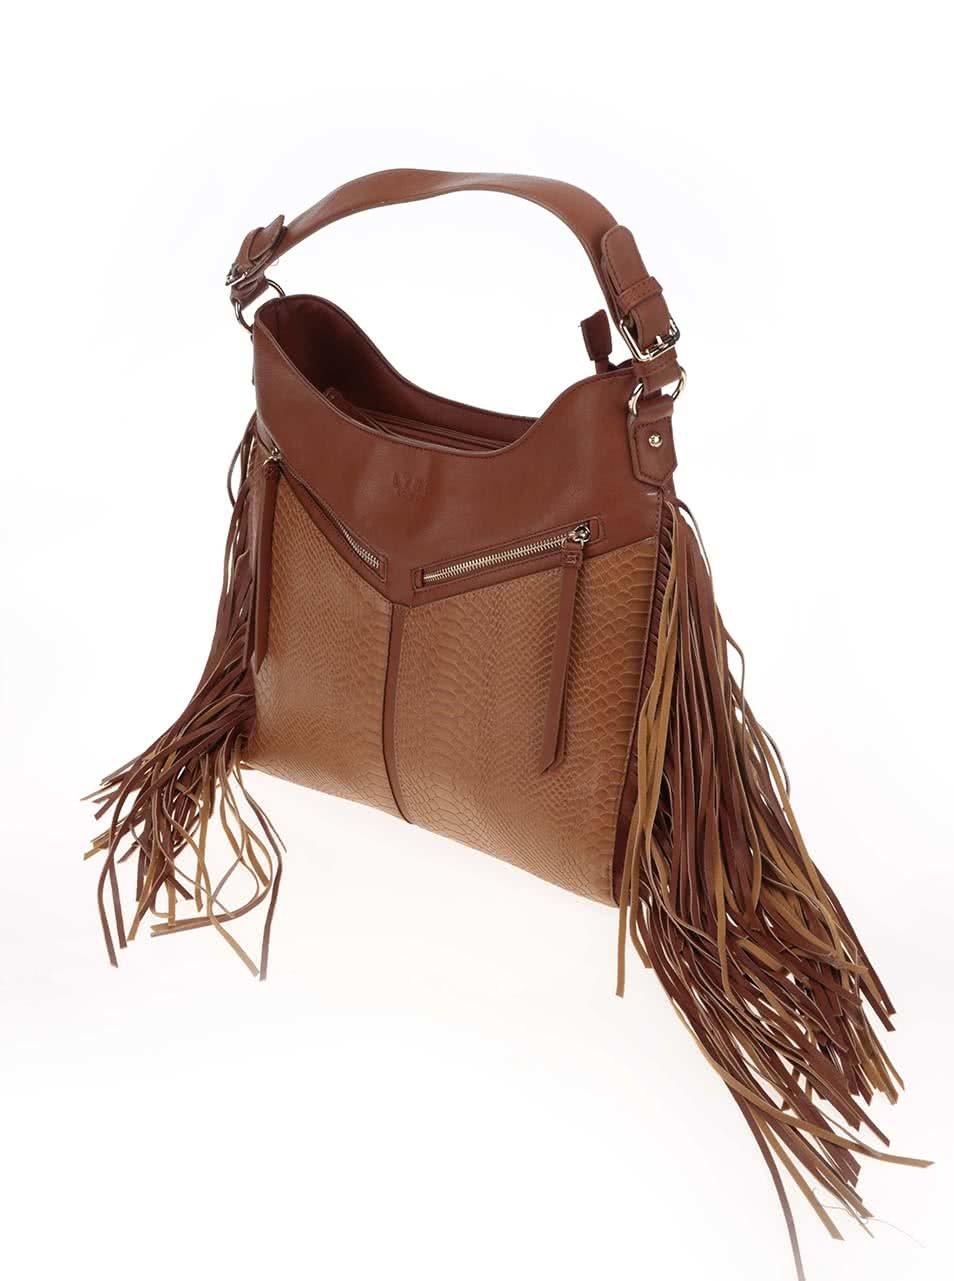 4b9b80b71e Hnedá kabelka so strapcami LYDC ...